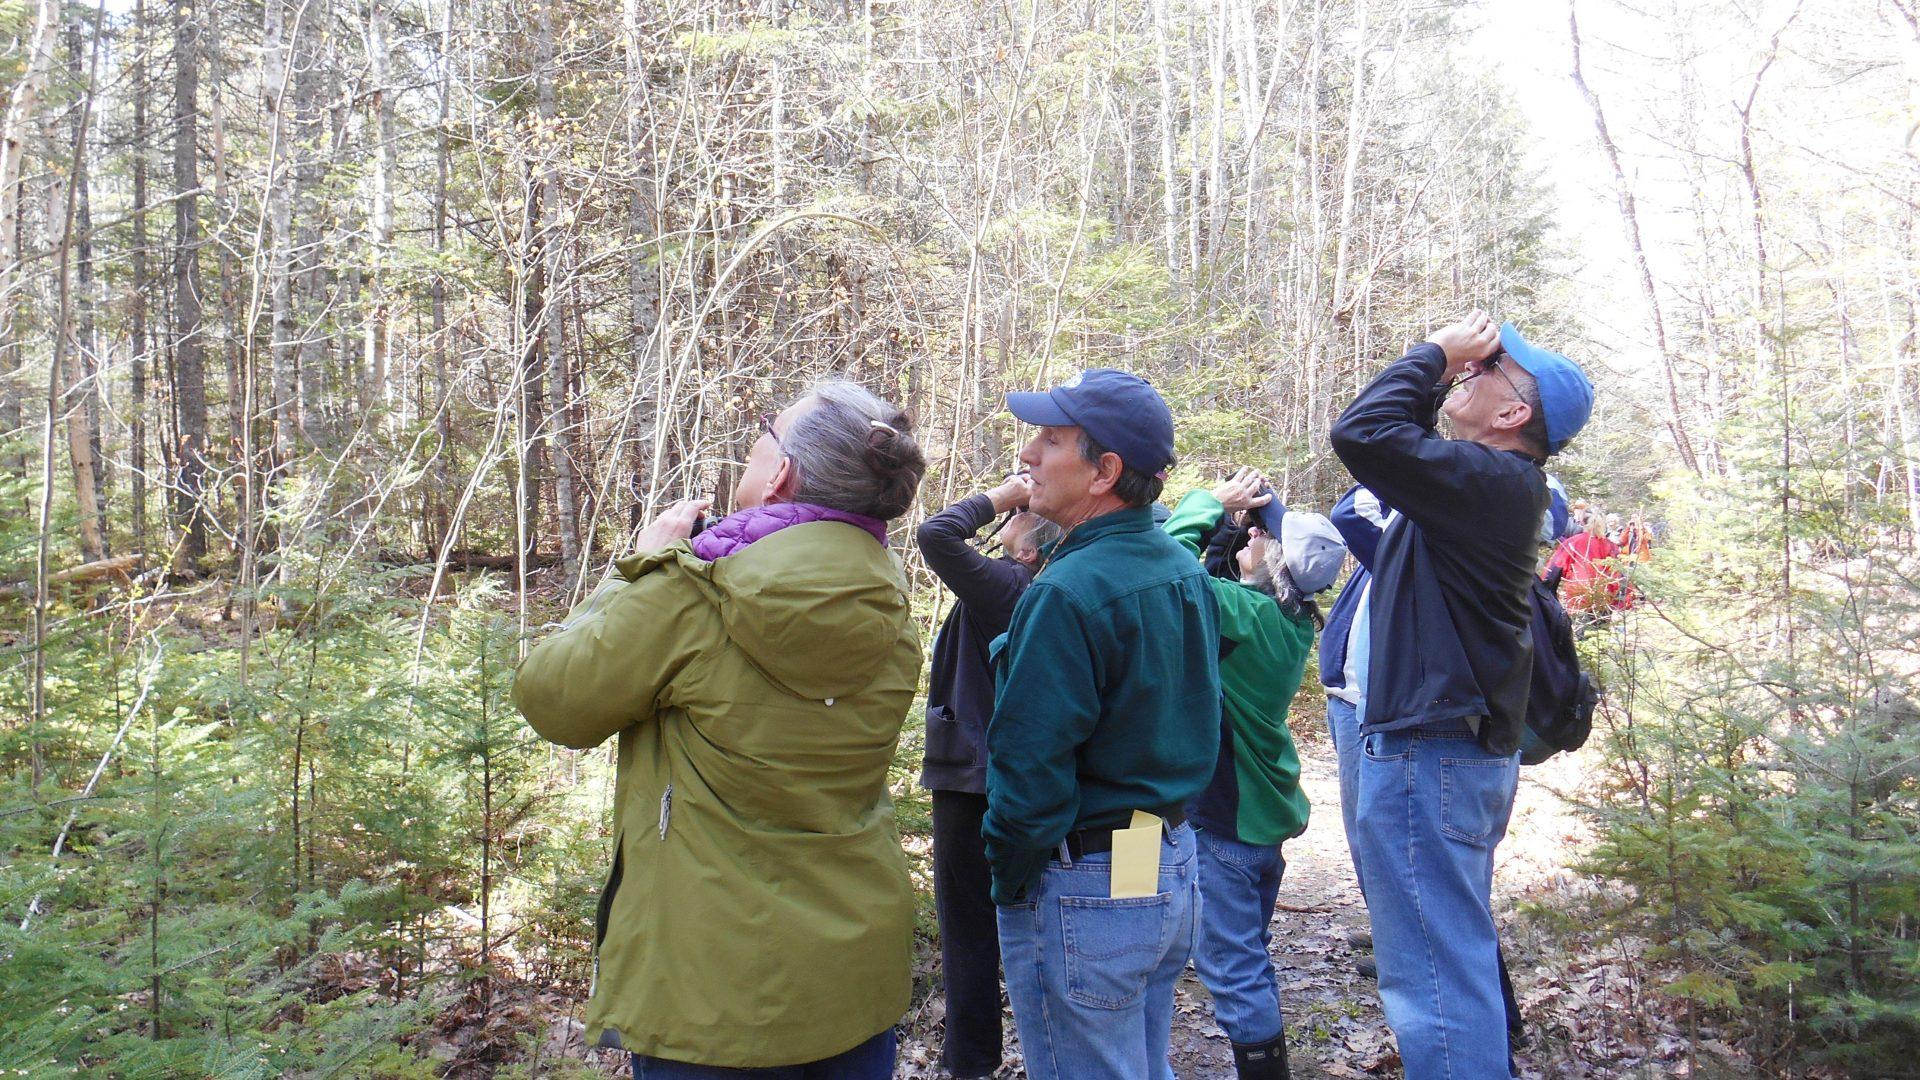 FBC- Birdwatching (Old Pond Railway Trail, Hancock)